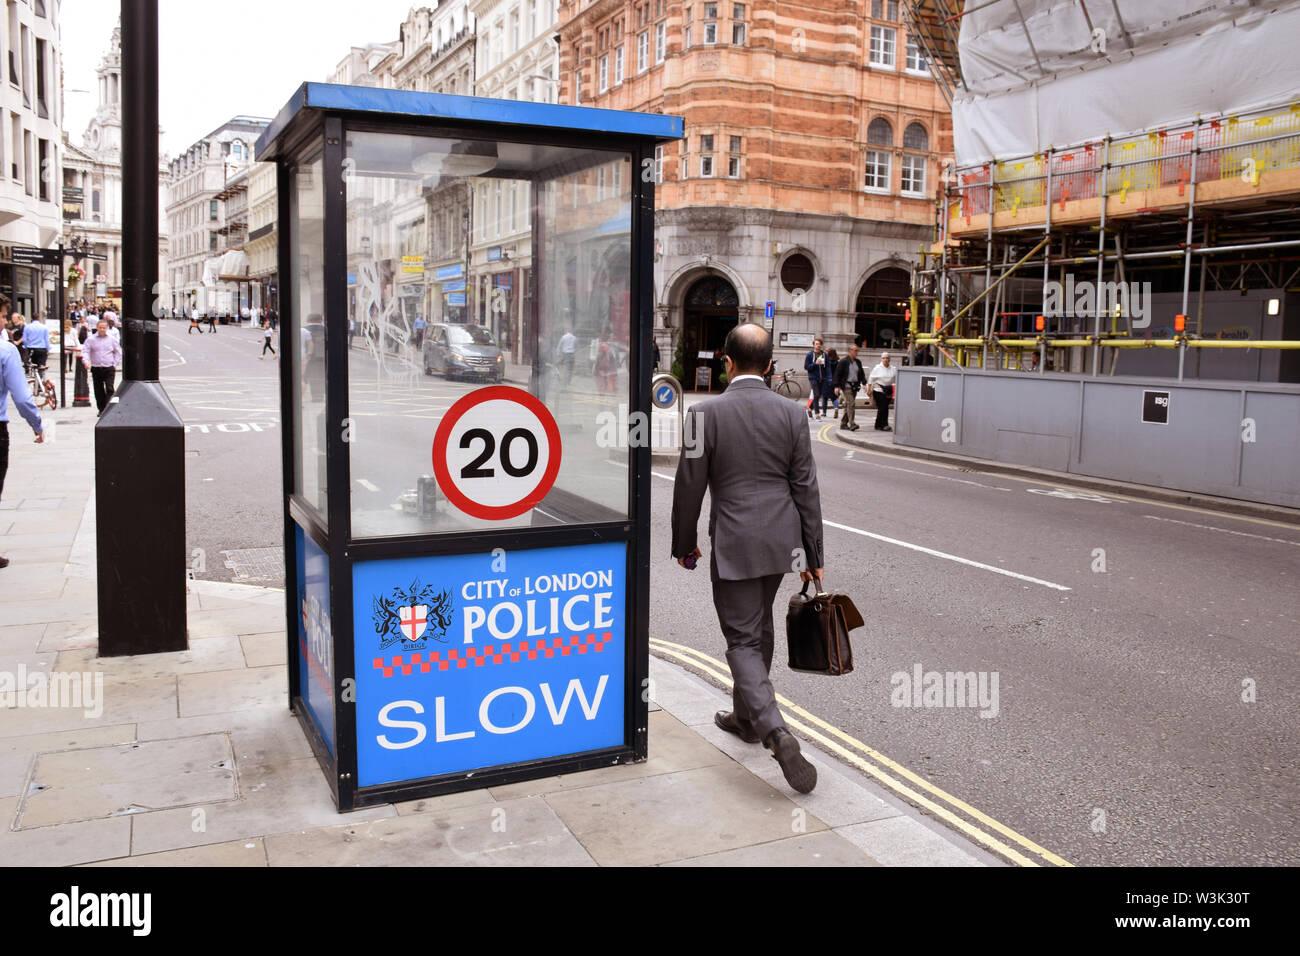 City of London police box, Fleet Street, London UK 2019 Stock Photo